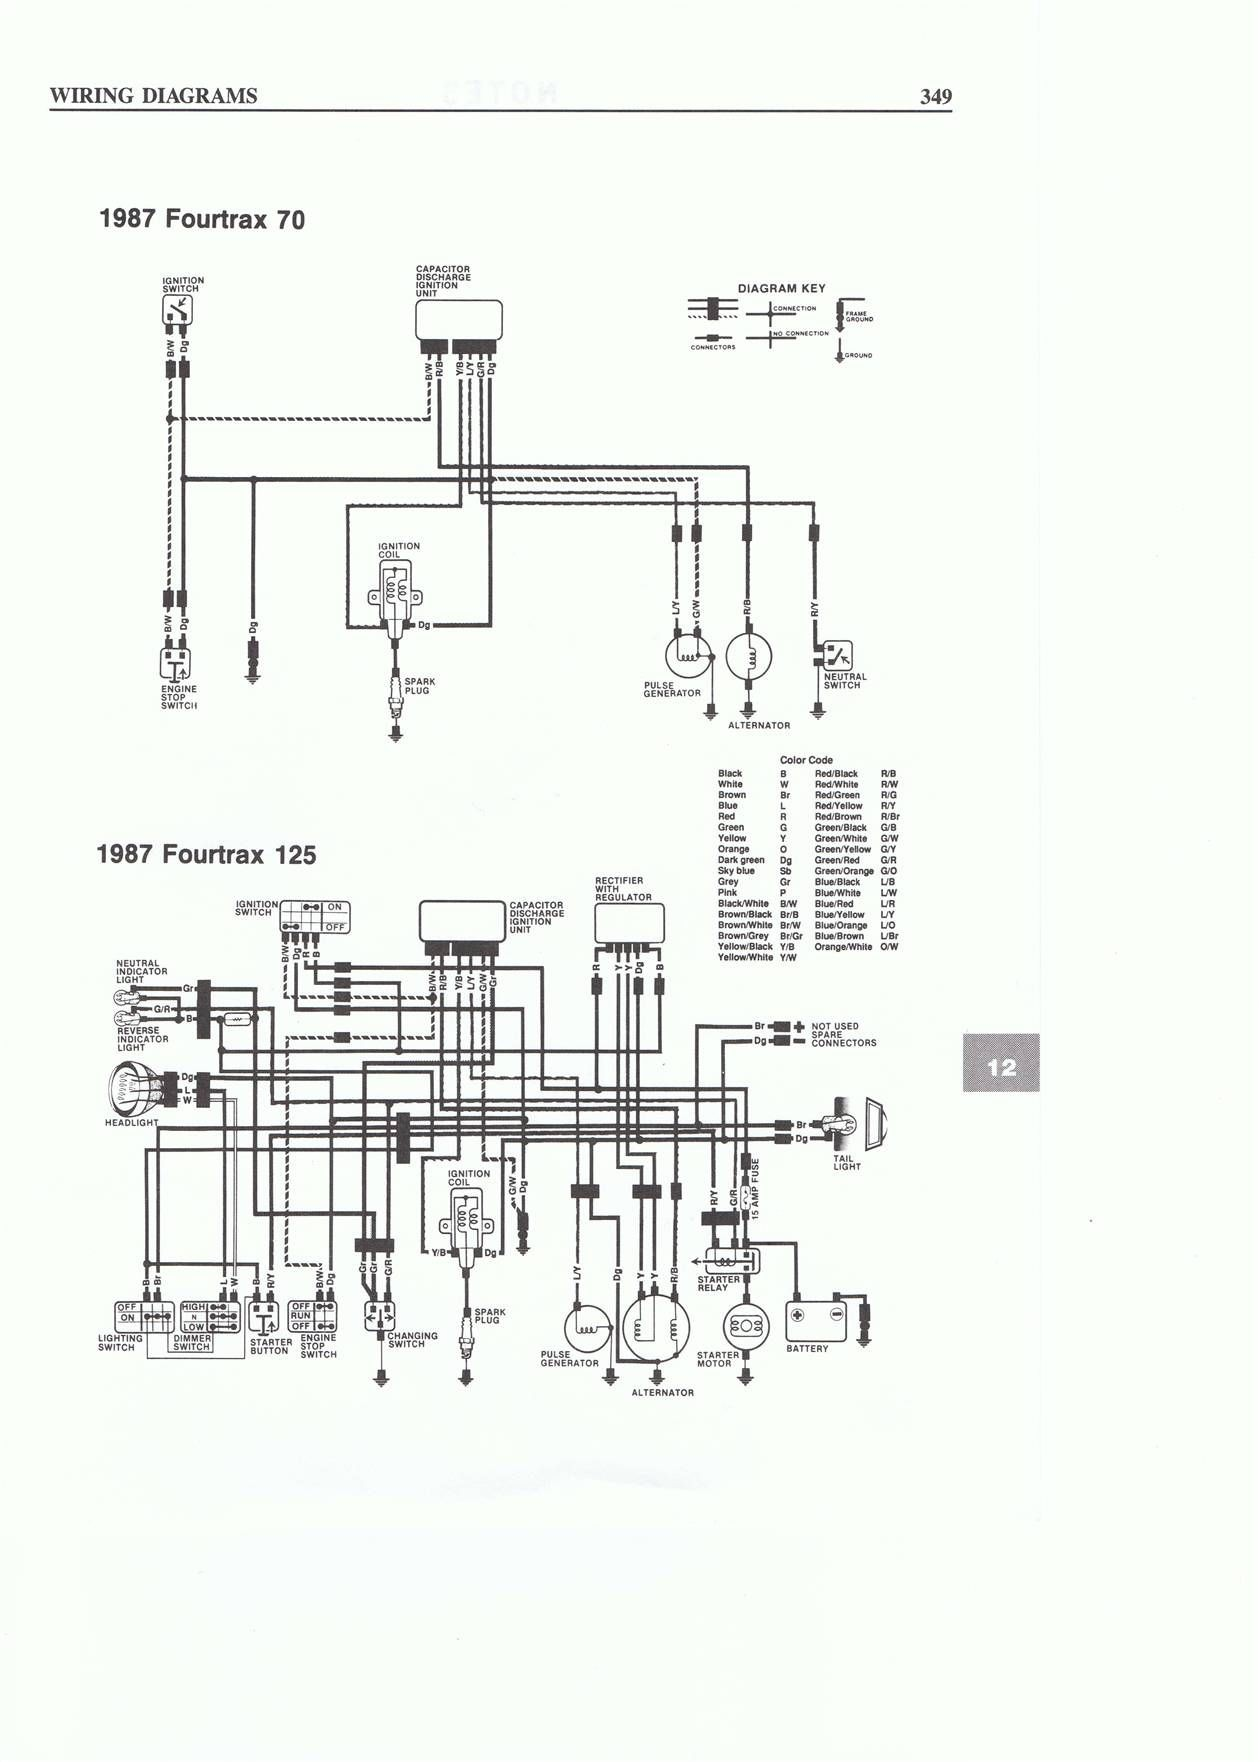 Flathead Engine Diagram Gy6 Engine Wiring Diagram Diy and Crafts Pinterest Of Flathead Engine Diagram